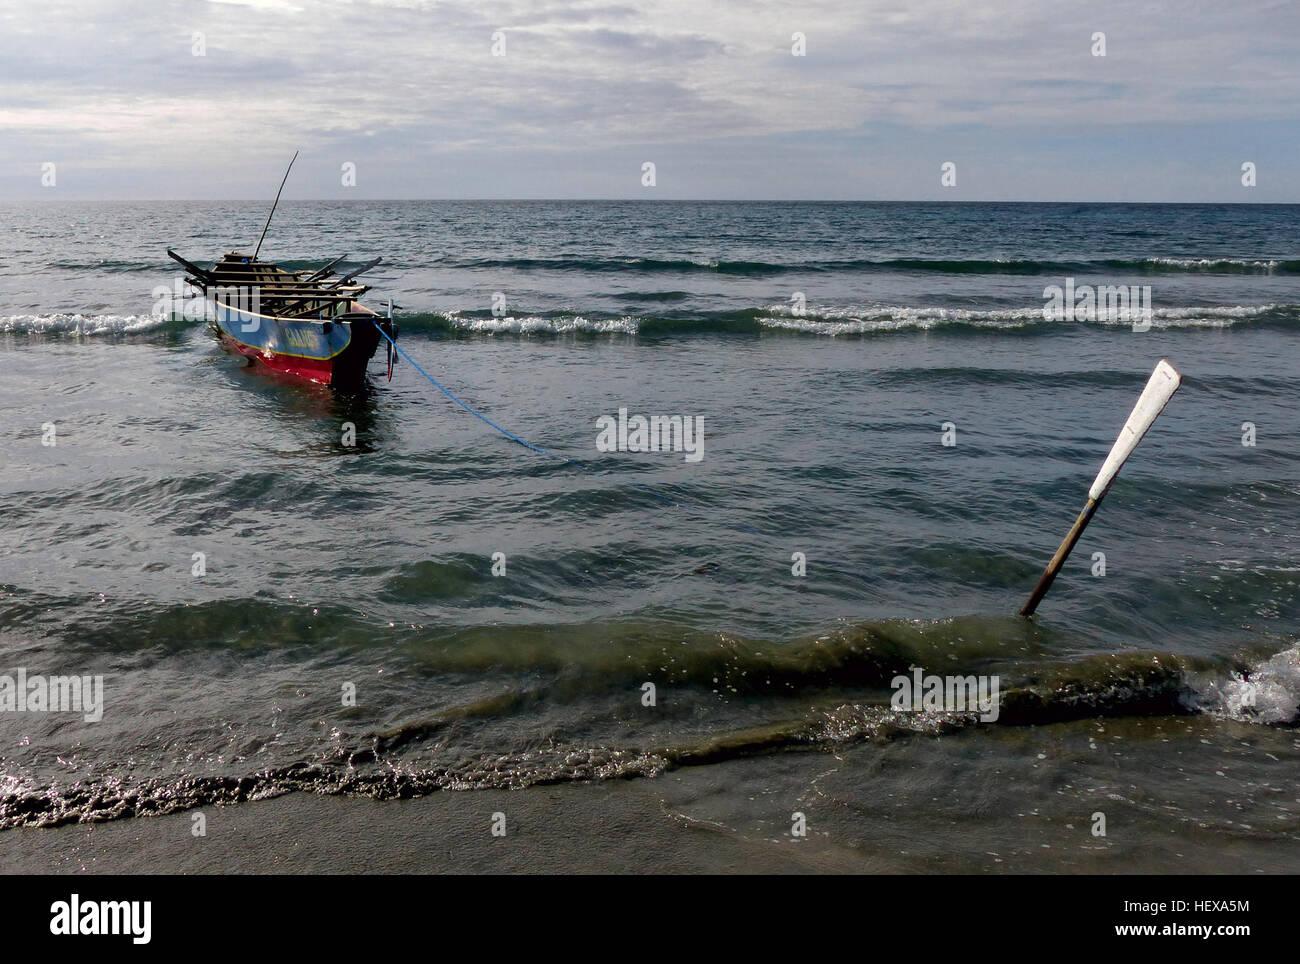 ication (,),Beach,Lumix FZ200,Ocean,Philippines,SEA,boat,oar,waves - Stock Image